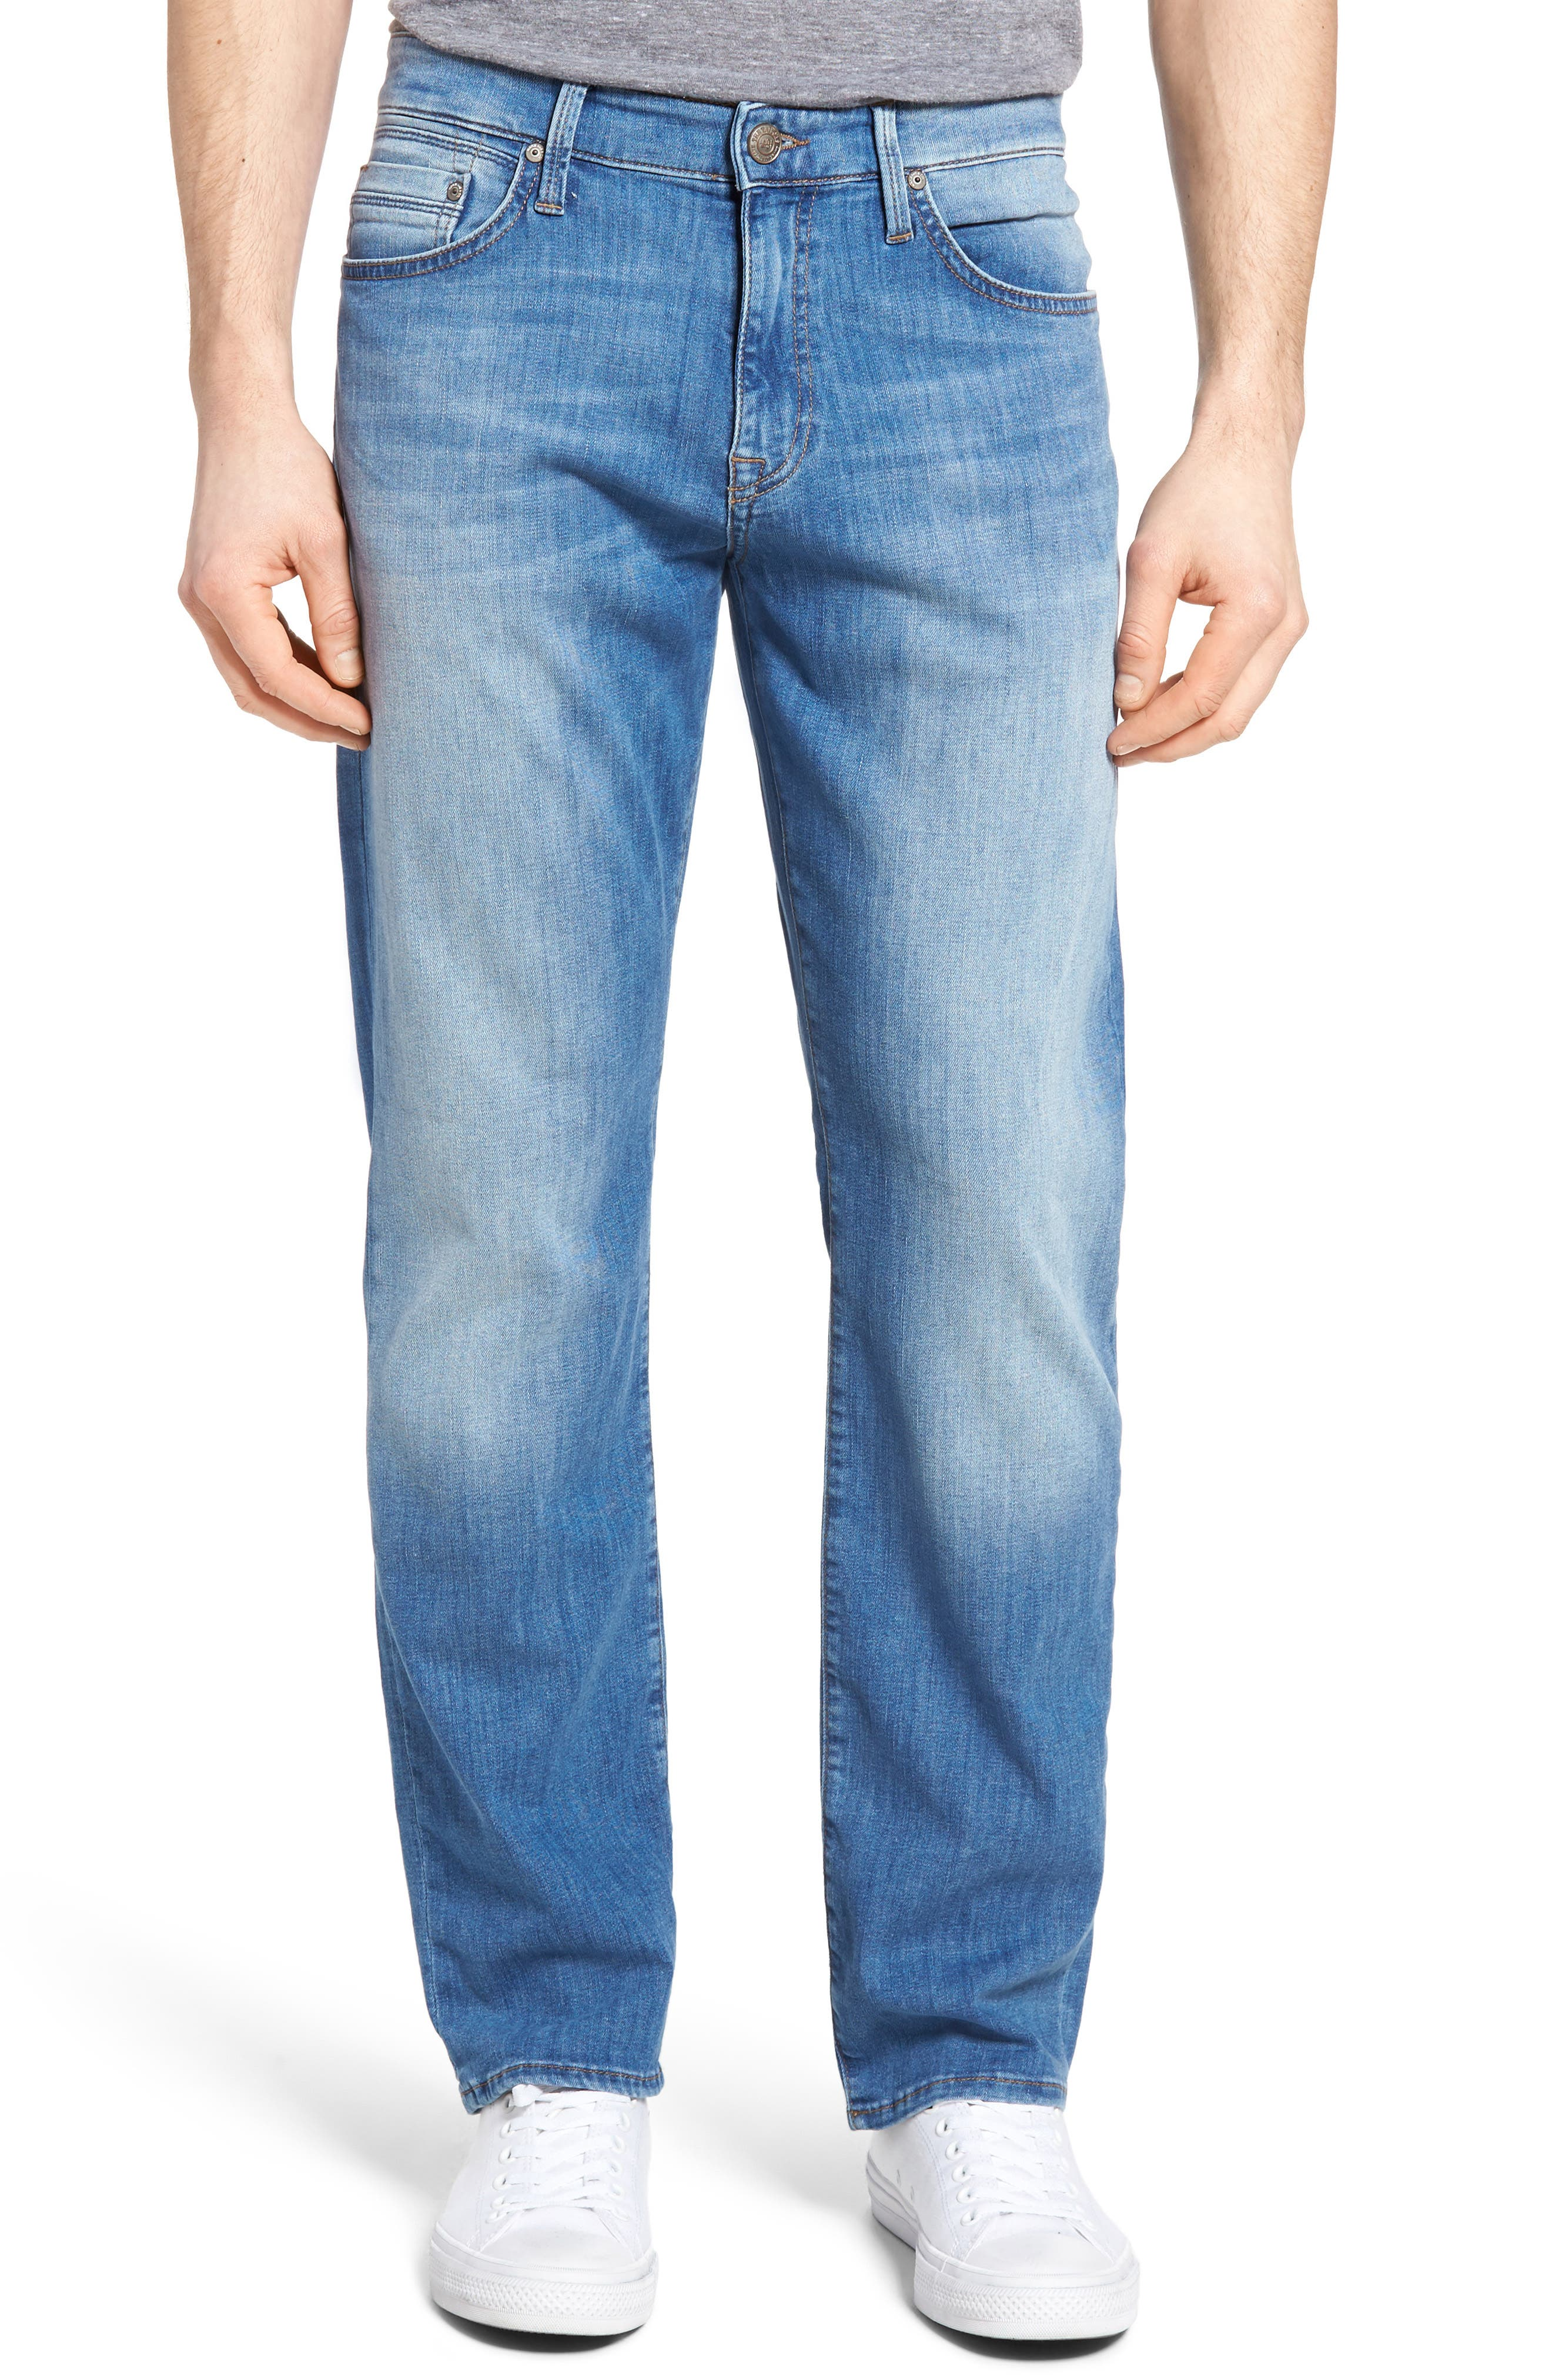 Myles Straight Leg Jeans,                             Main thumbnail 1, color,